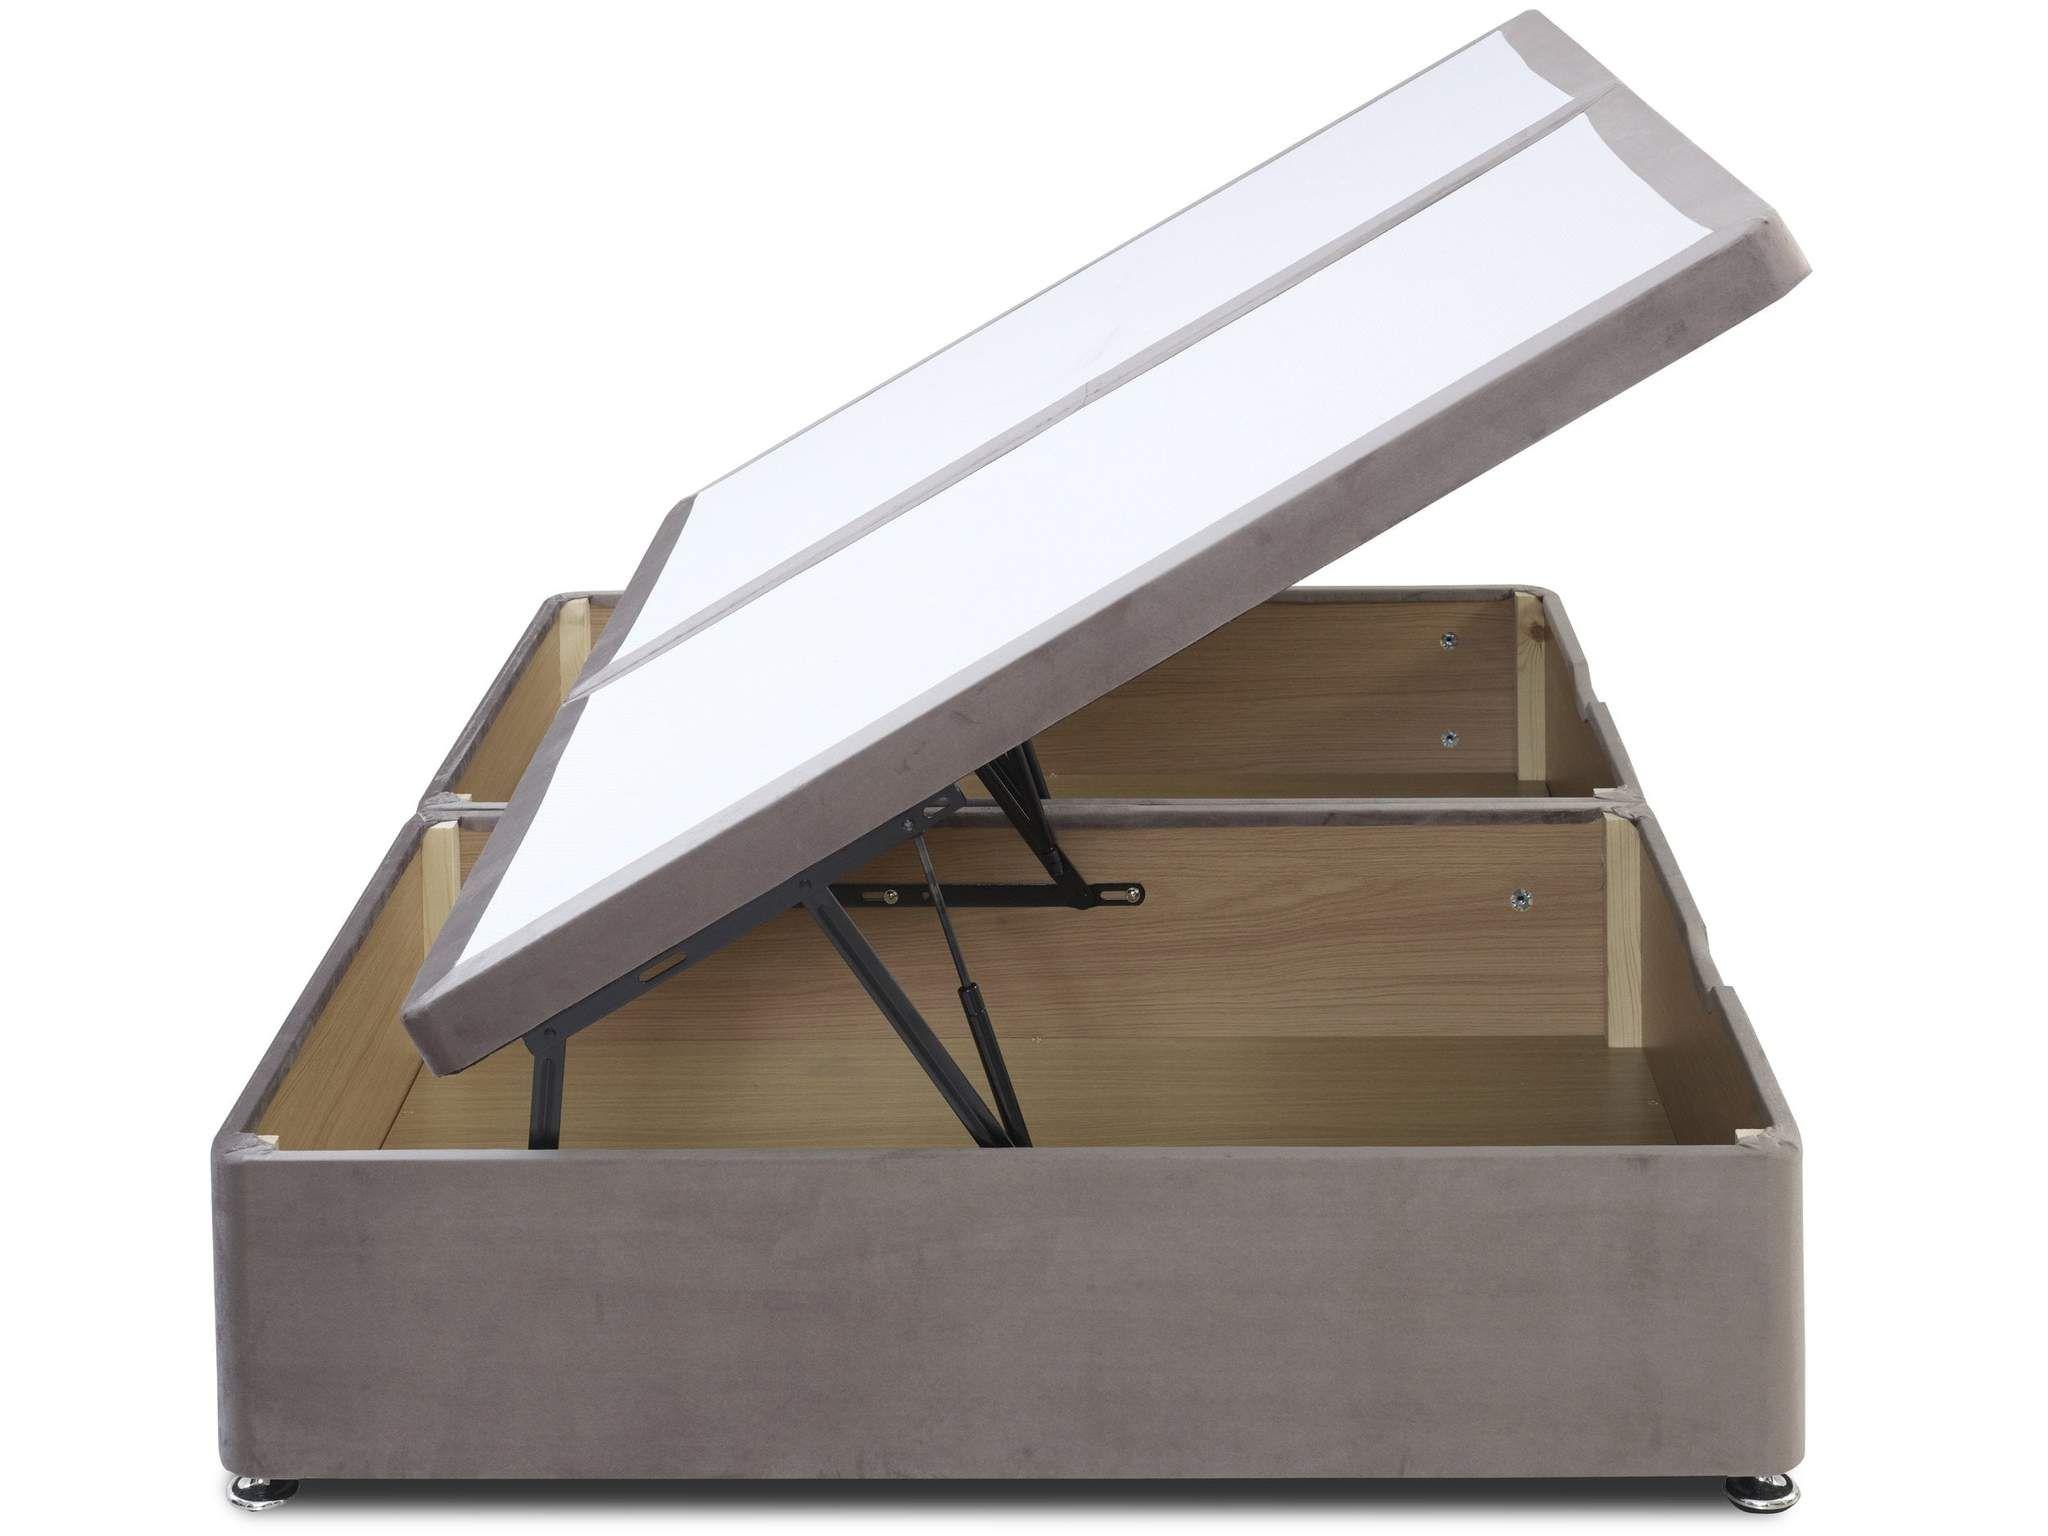 Fine Ottoman Storage Side Lift Divan Bed Base Ideas For The Machost Co Dining Chair Design Ideas Machostcouk